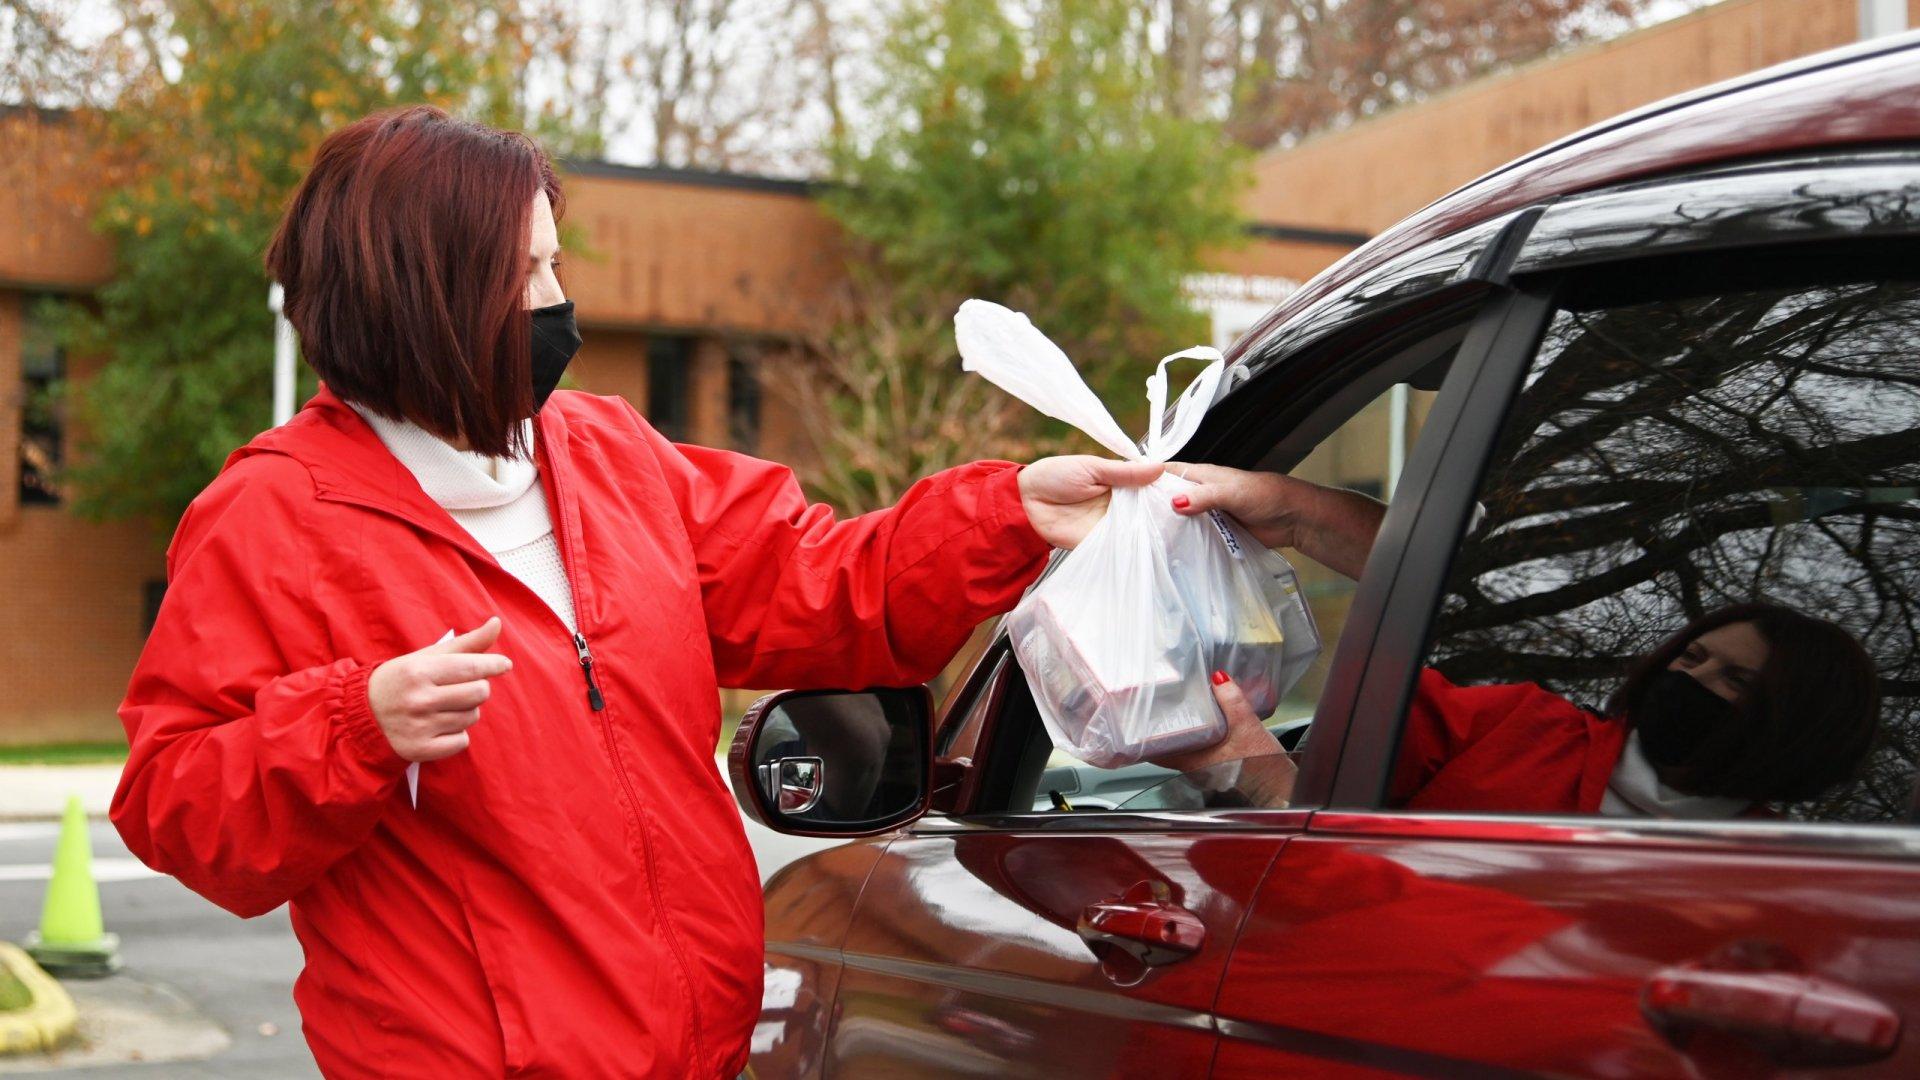 Volunteer in red coat handing bag of medicine to driver ofred car